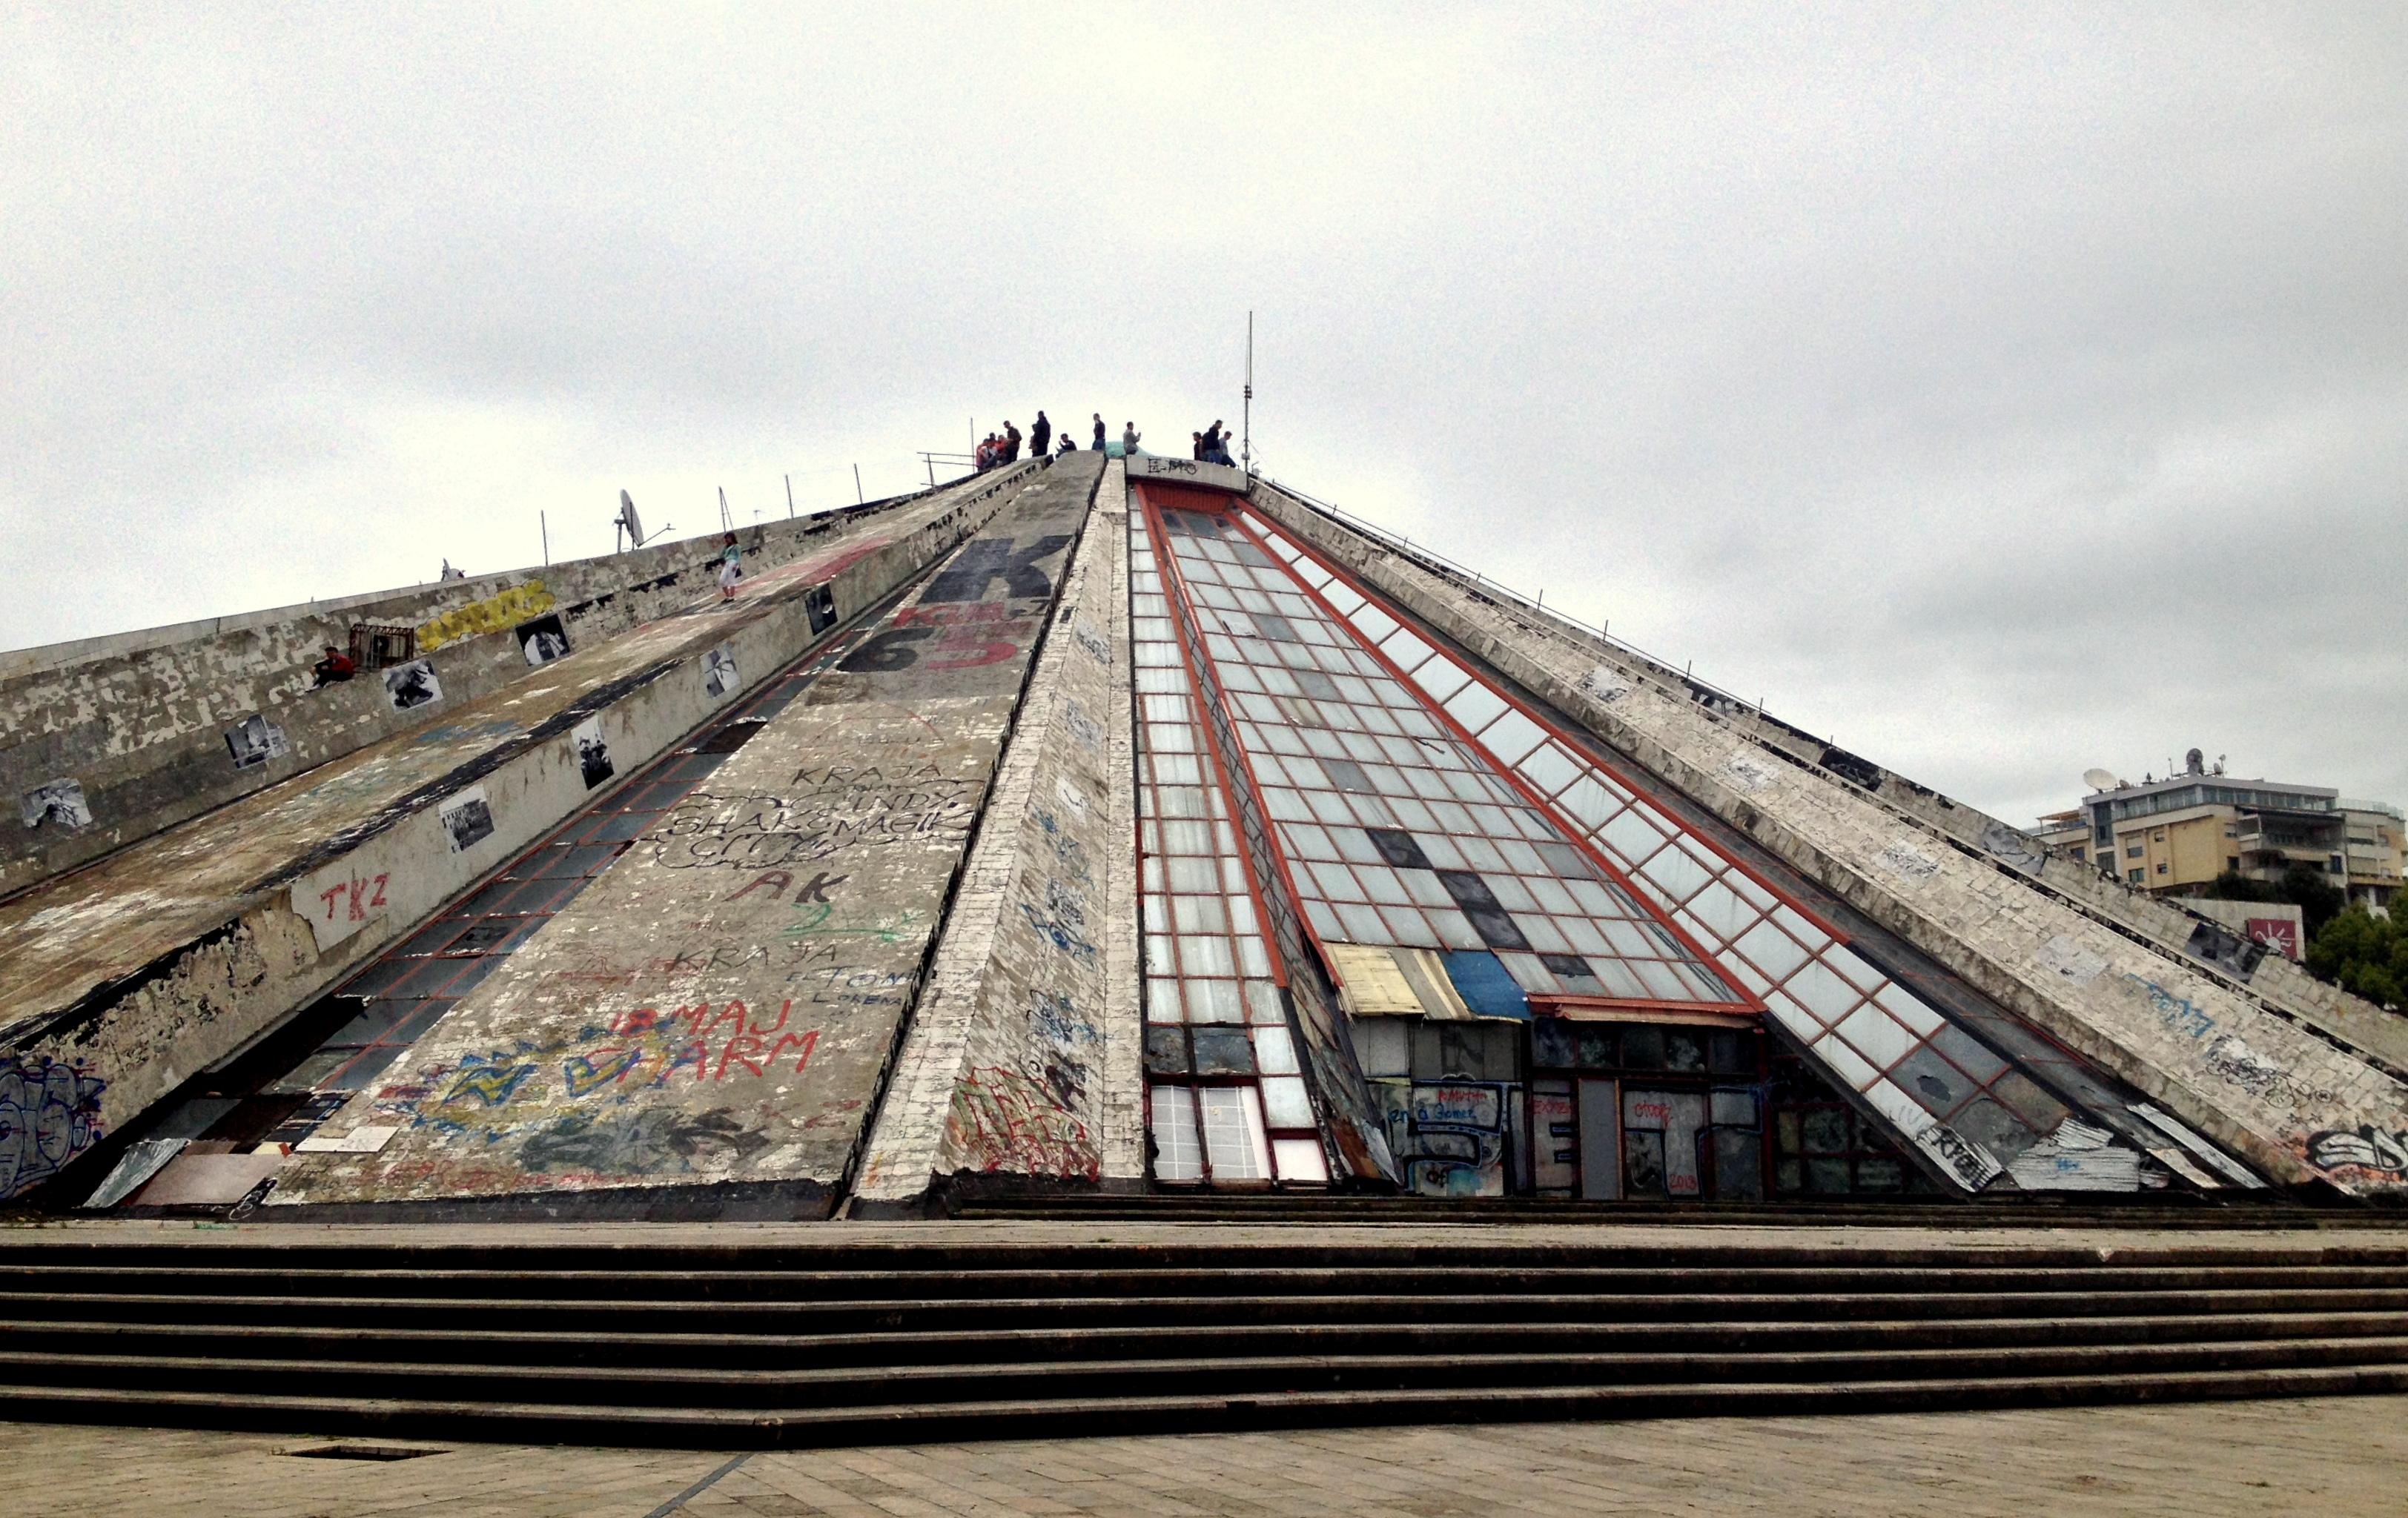 La pyramide de Tirana, ancien musée Albanie